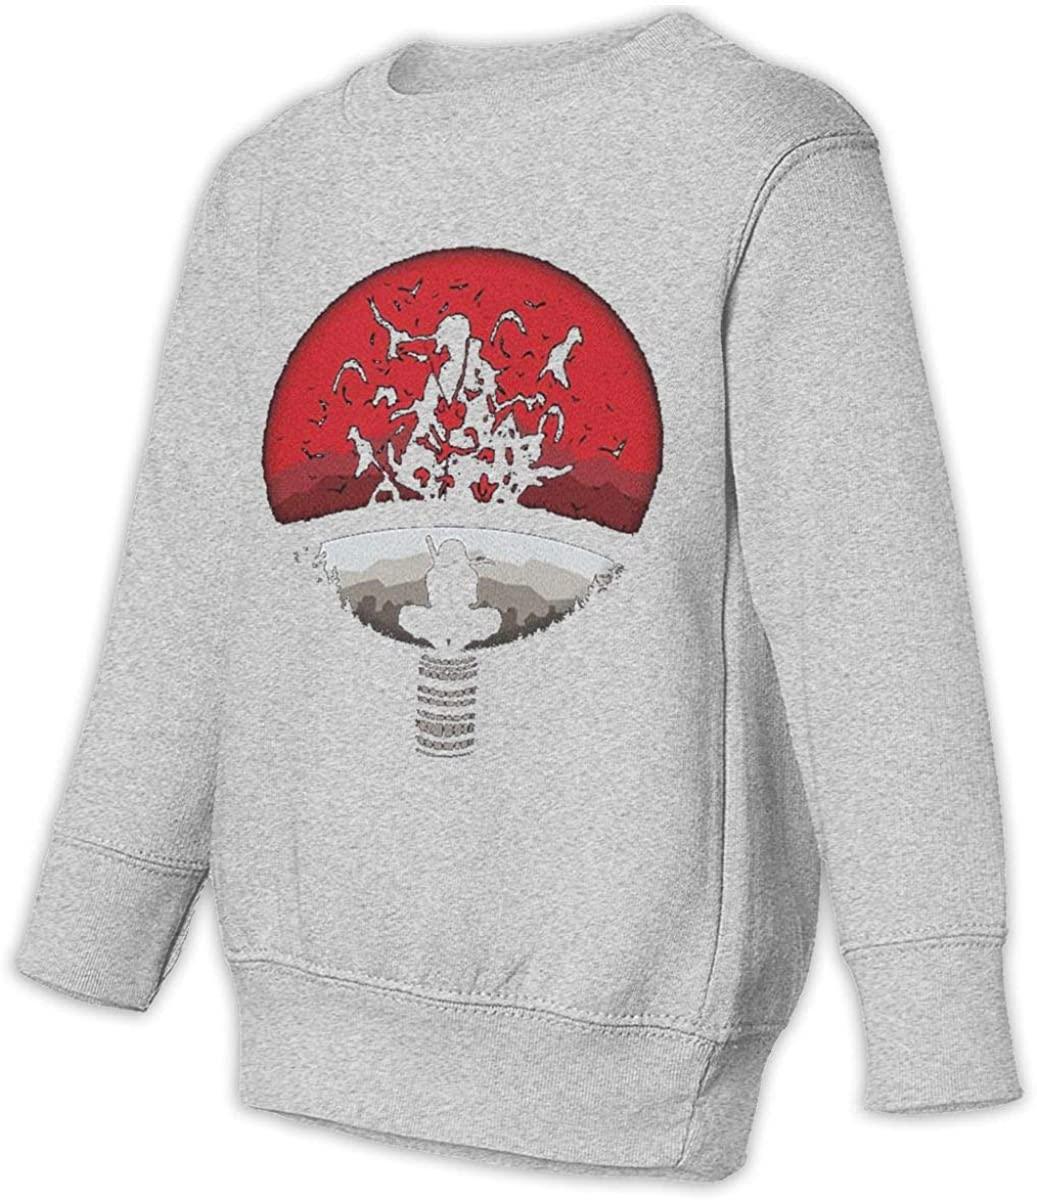 AP.Room Uchiha Clan Symbol Juvenile and Toddler Sweatshirt Handsome Fashion